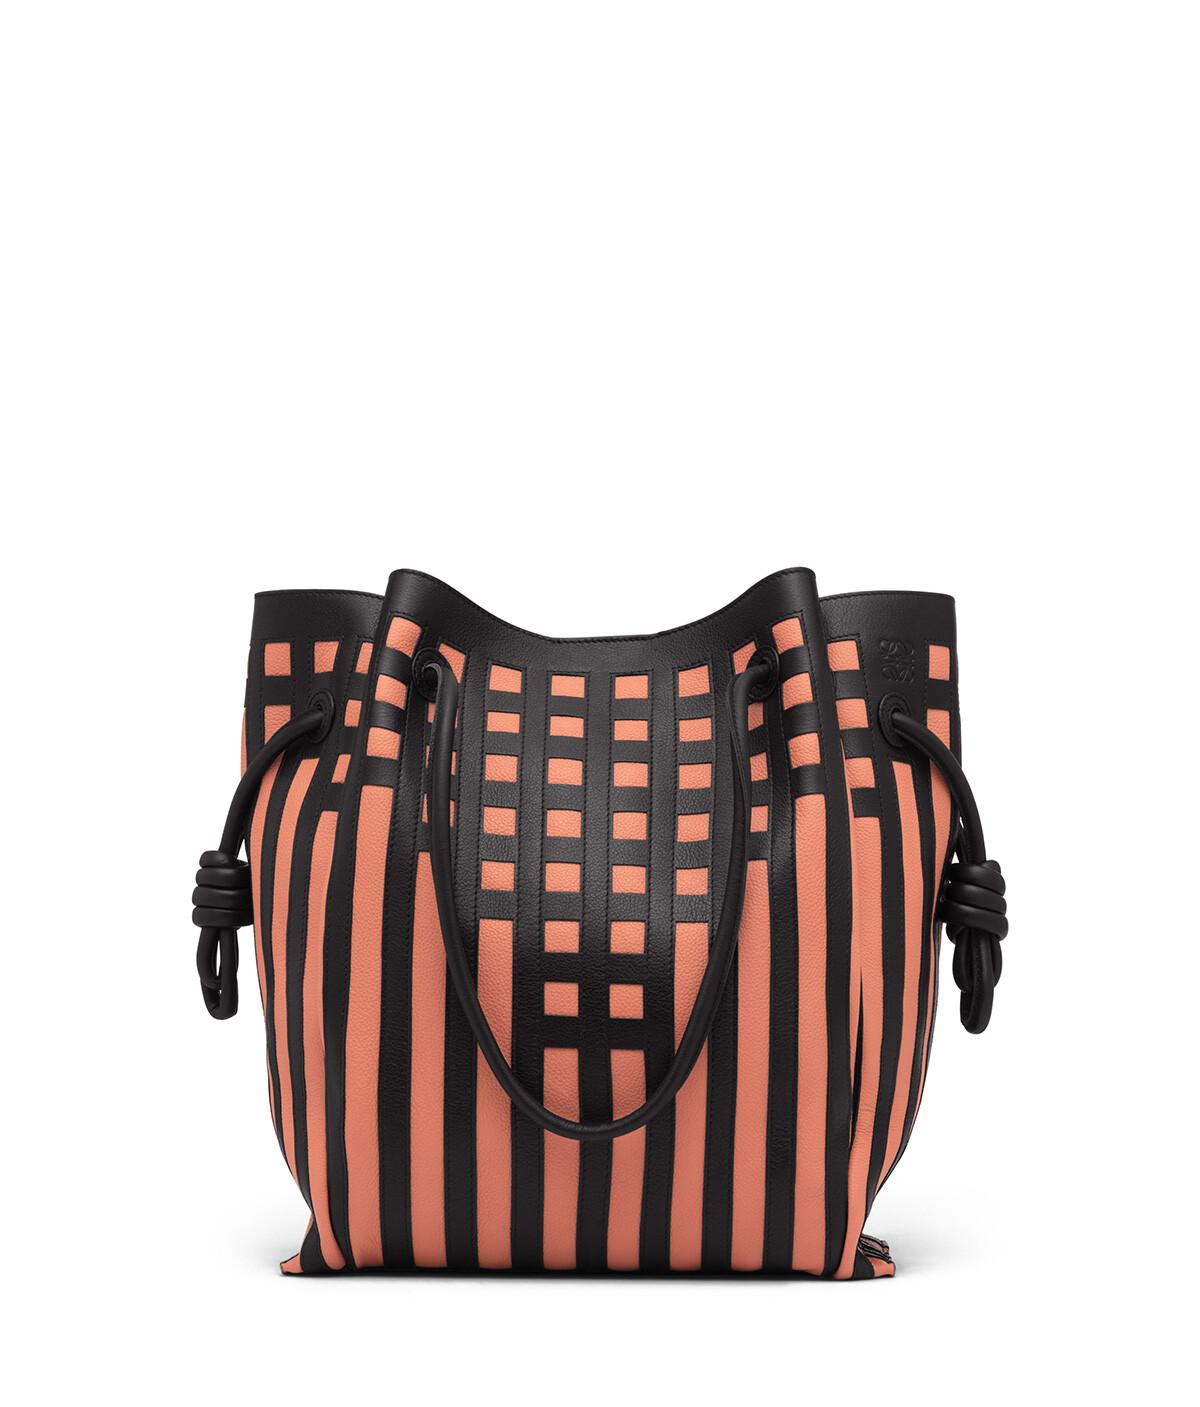 LOEWE Flamenco Knot Tote Grid Bag Black/Pink Tulip front